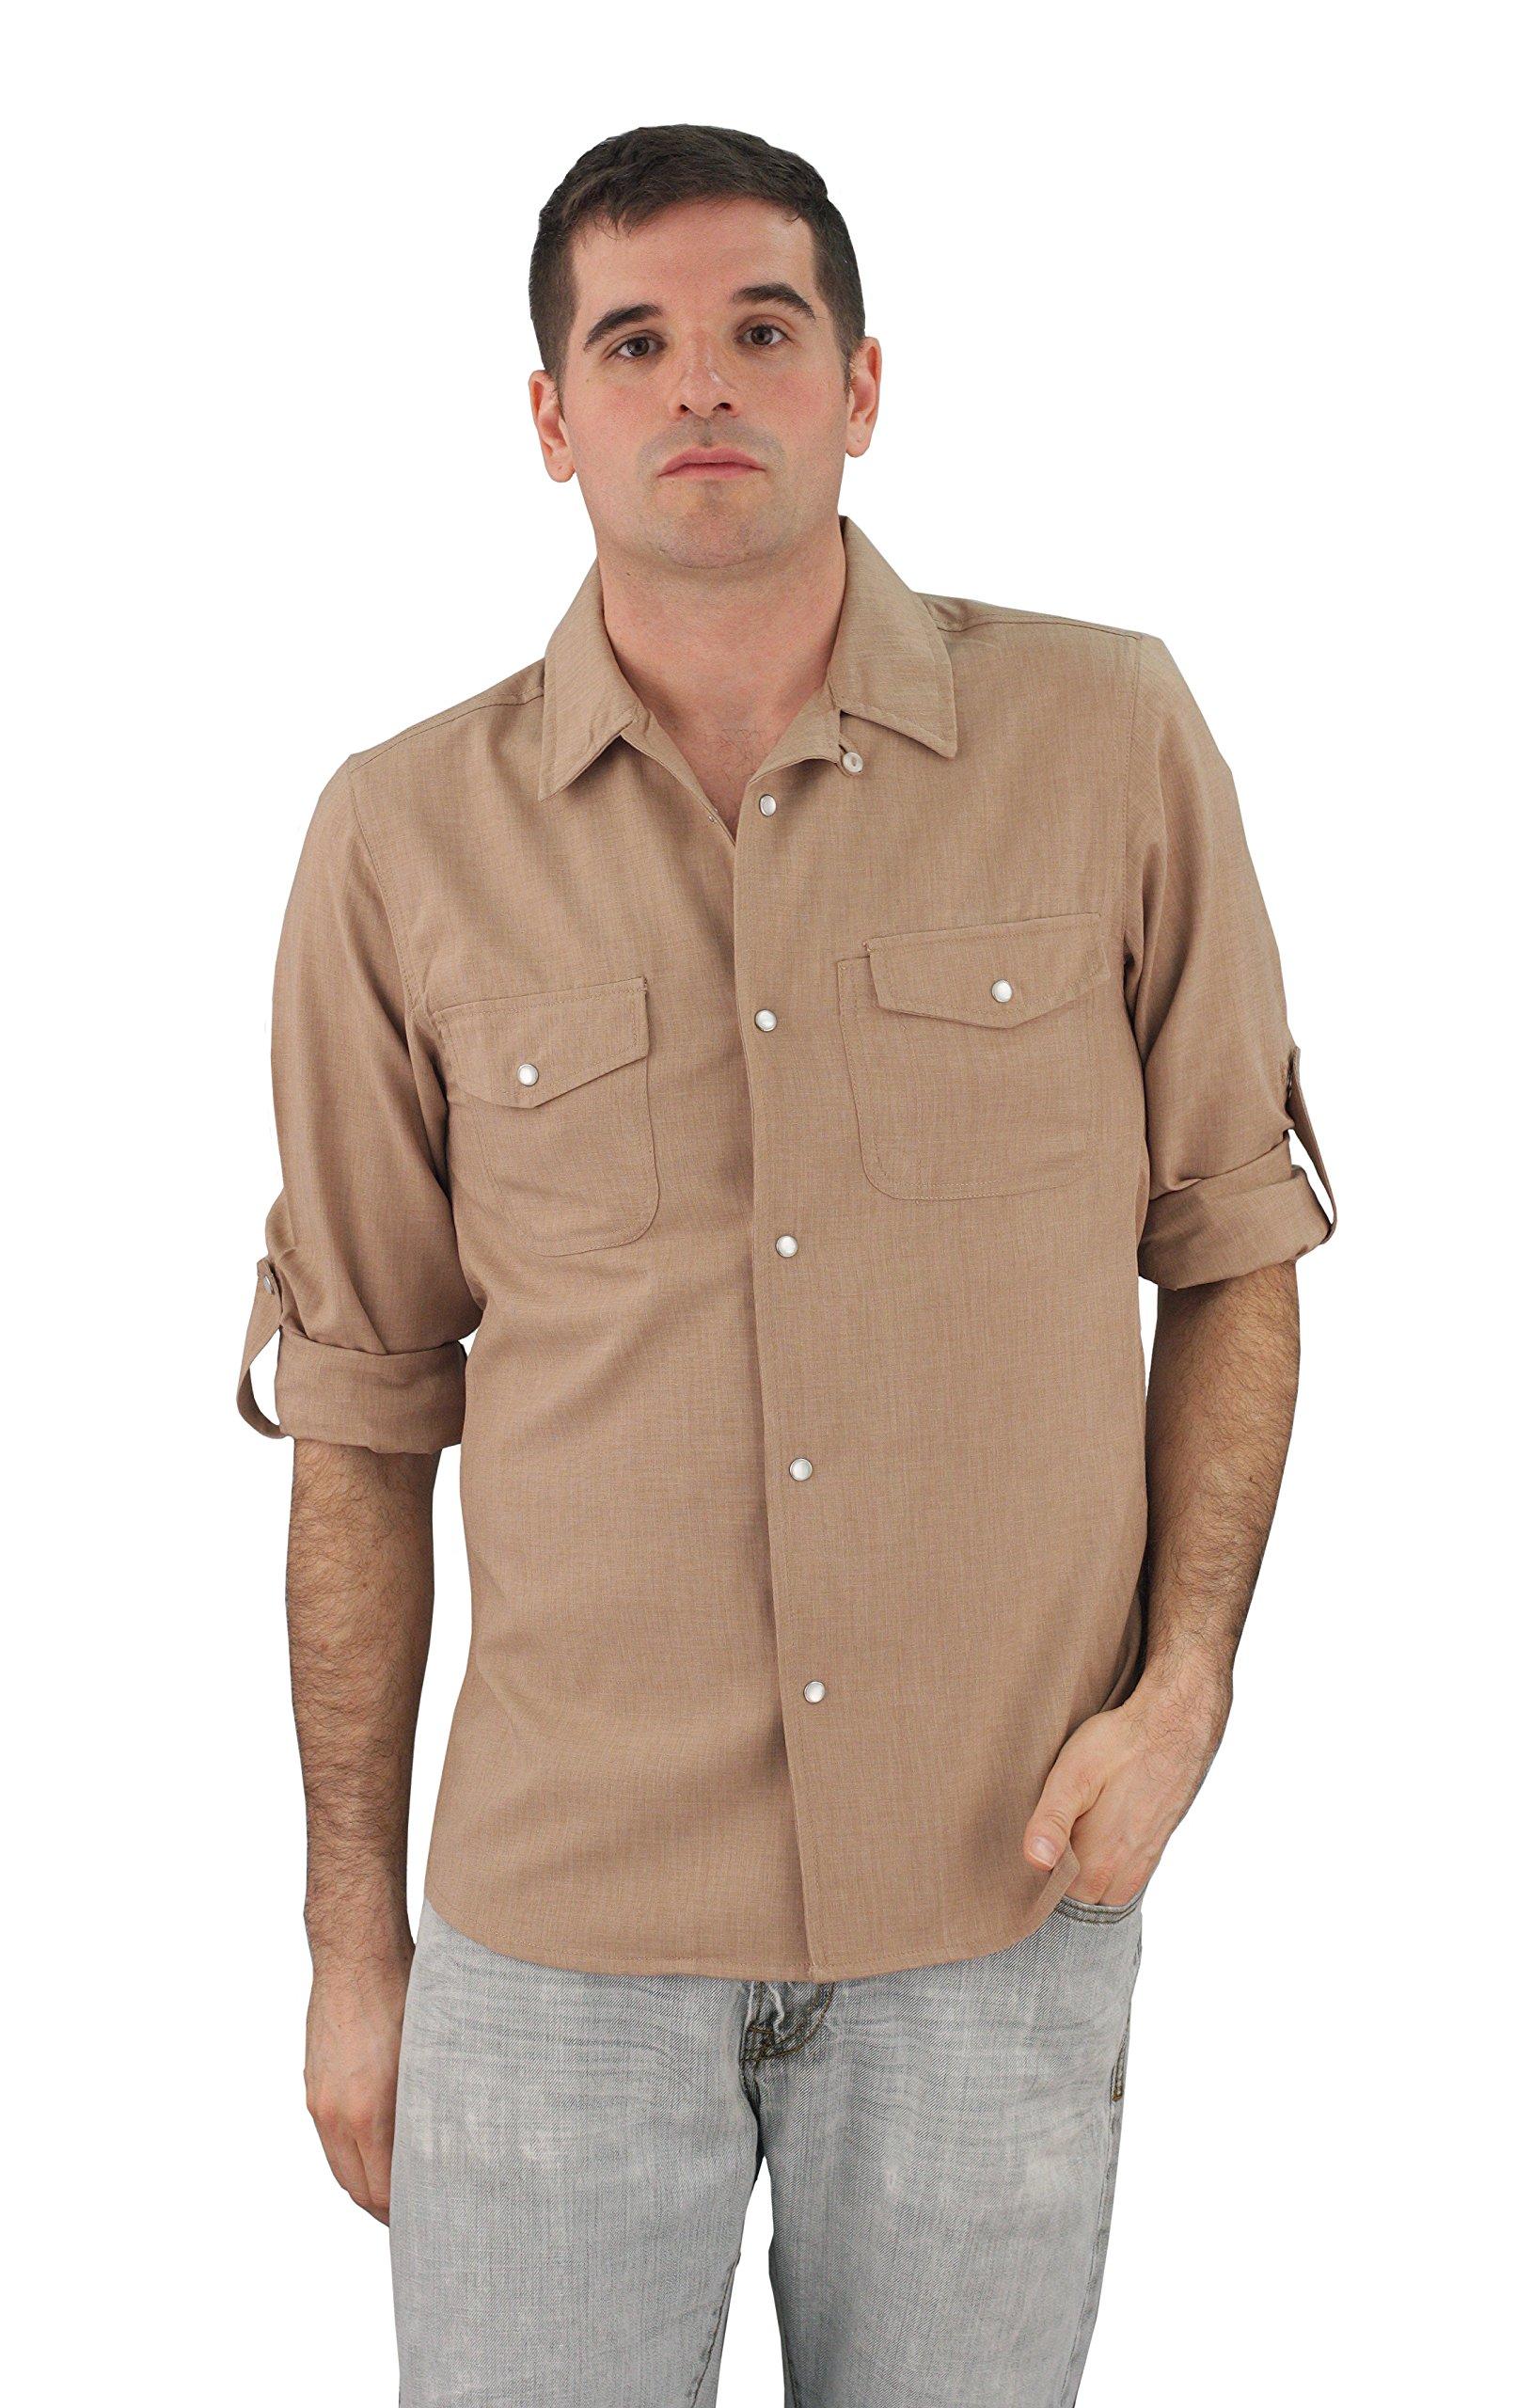 ASD Living Zanzibar Long Sleeve Dry Fit Server Waitstaff Shirt, XX-Large, Almond by ASD Living